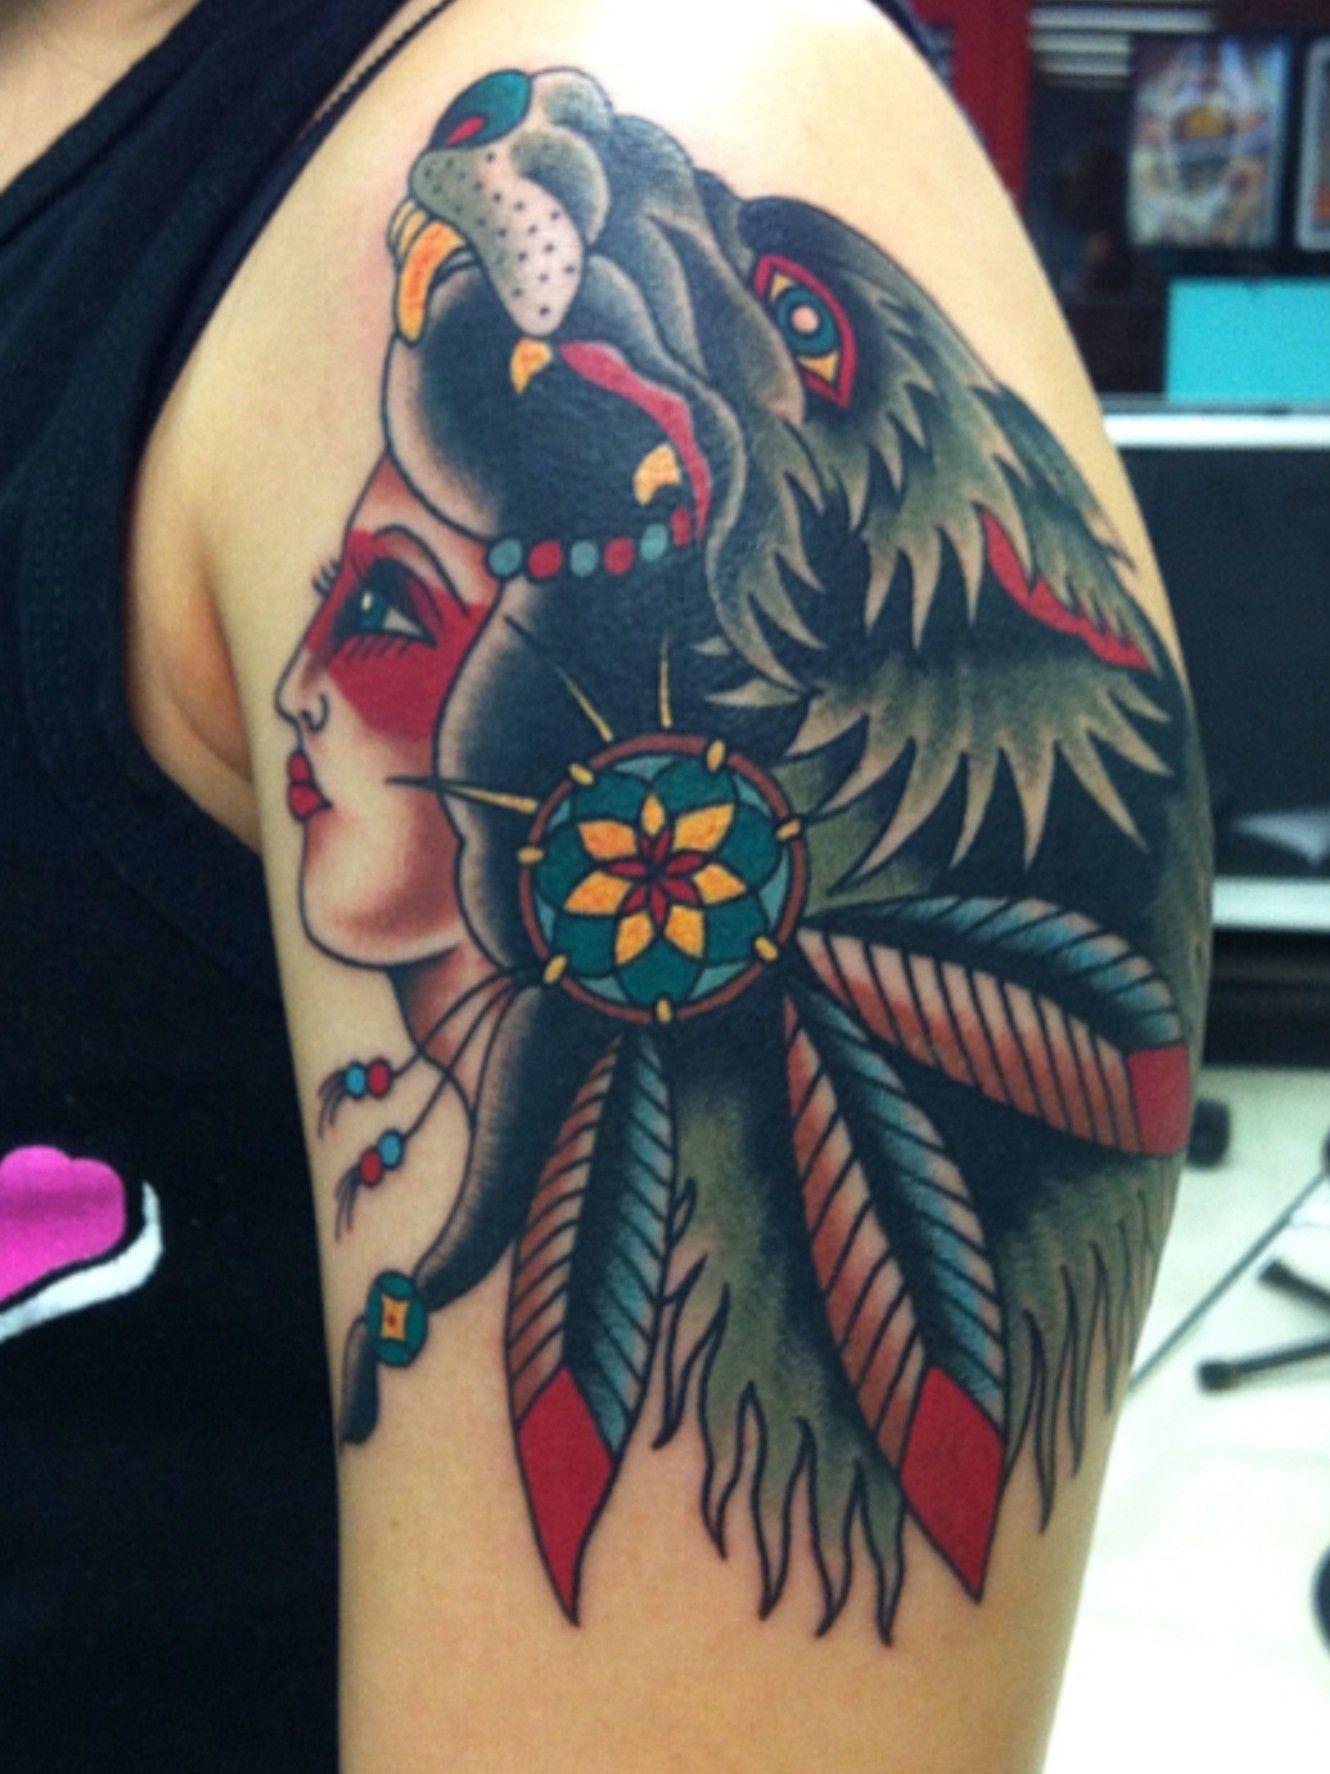 Pin By Dee Stewart On Tattoos In 2020 Tattoos American Traditional Tattoo Traditional Tattoo